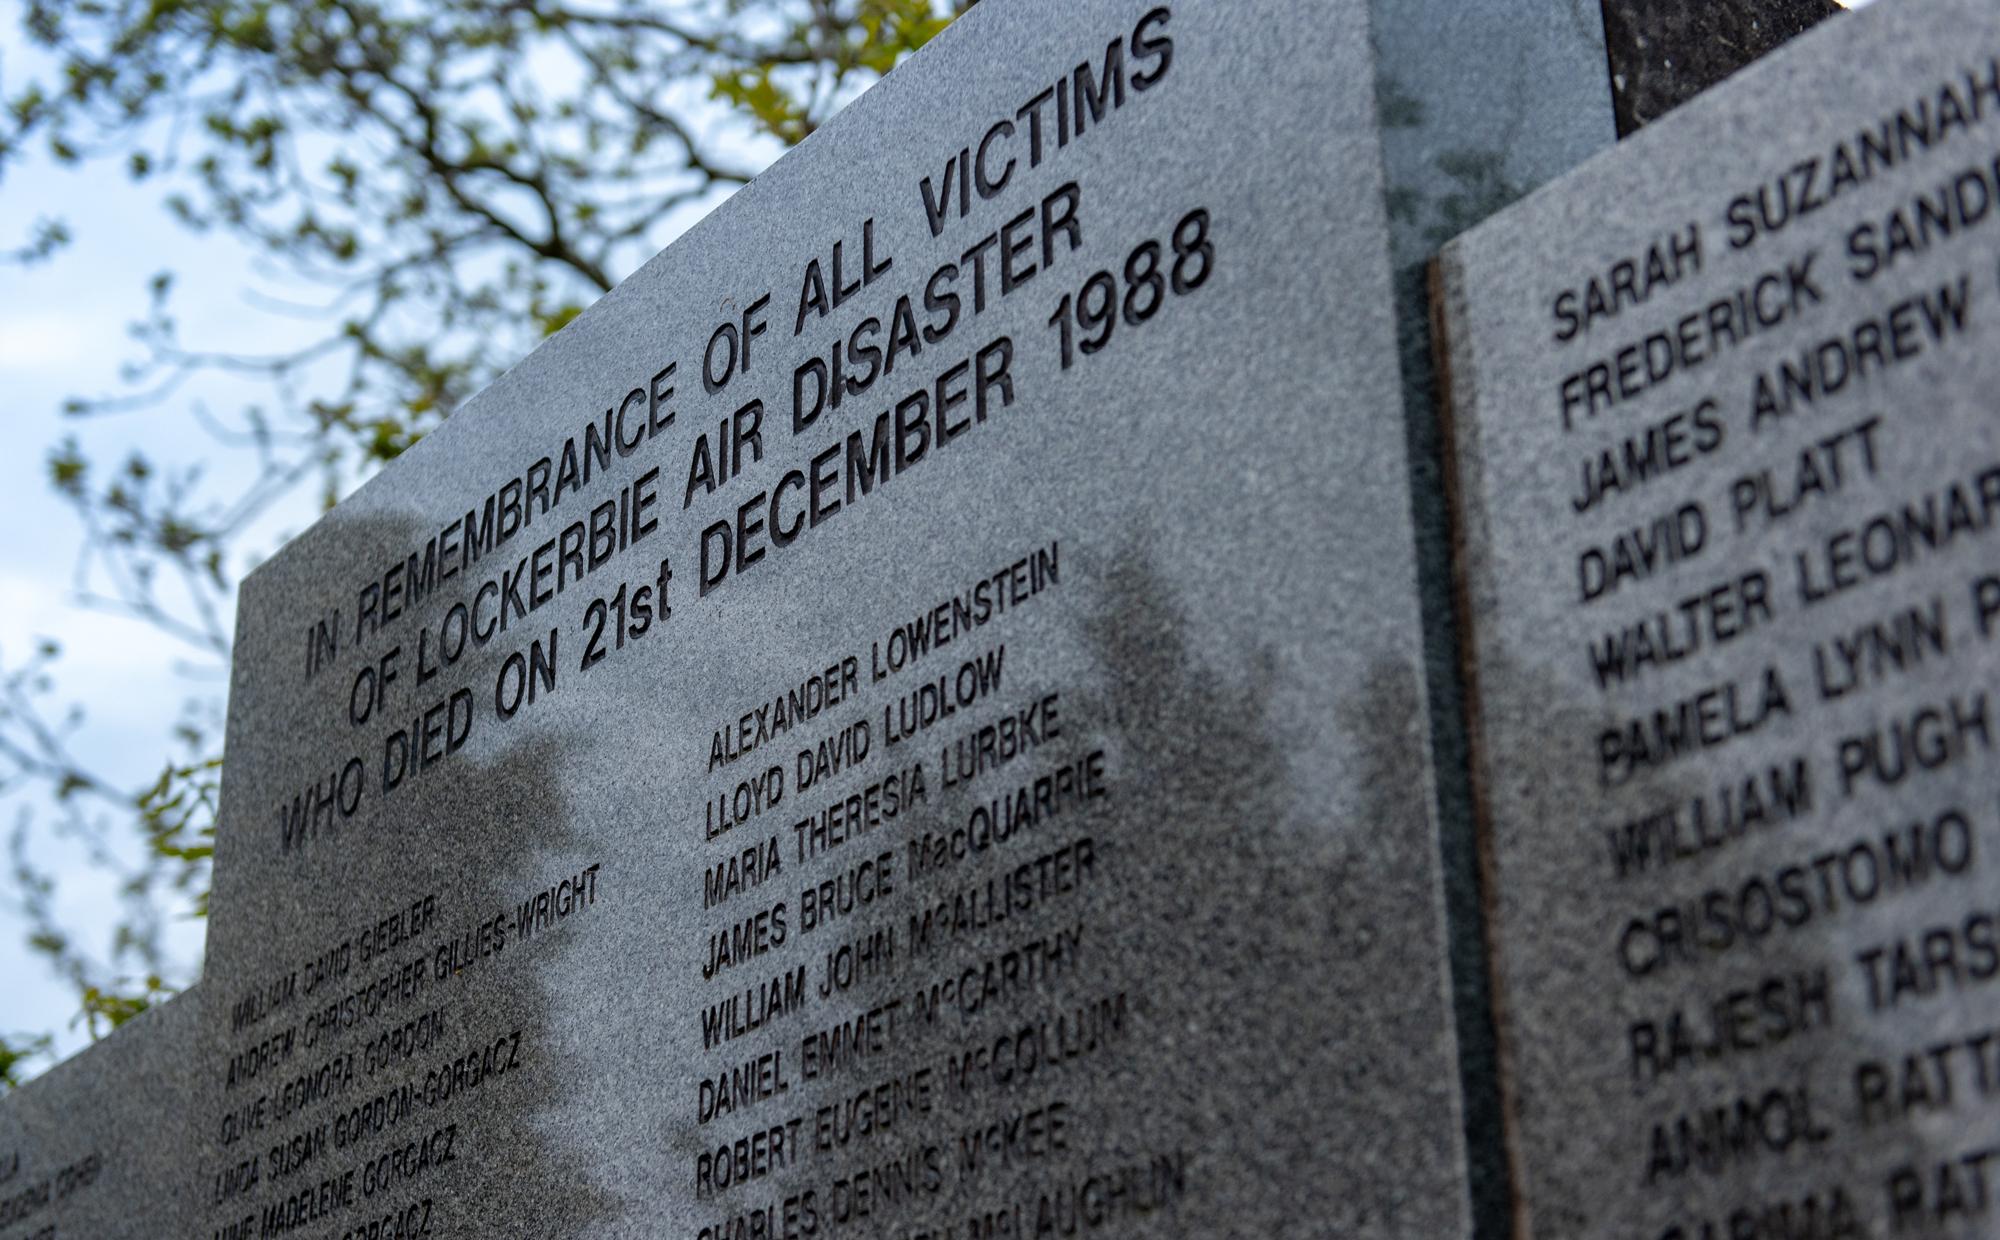 Remembering Pan Am Flight 103 — FBI